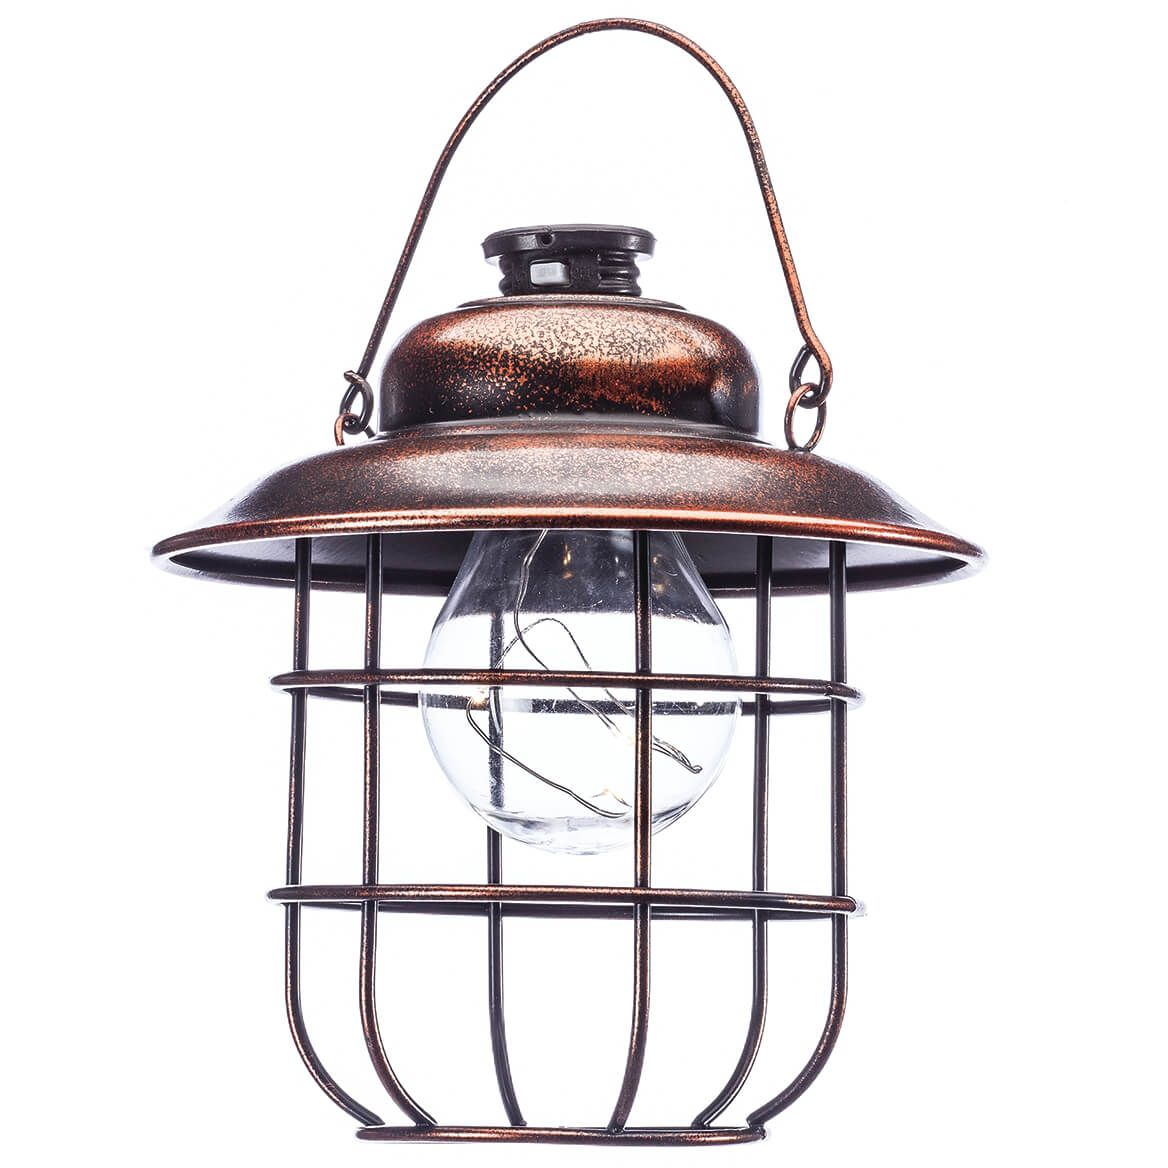 Copper Solar Hanging Lantern-362344